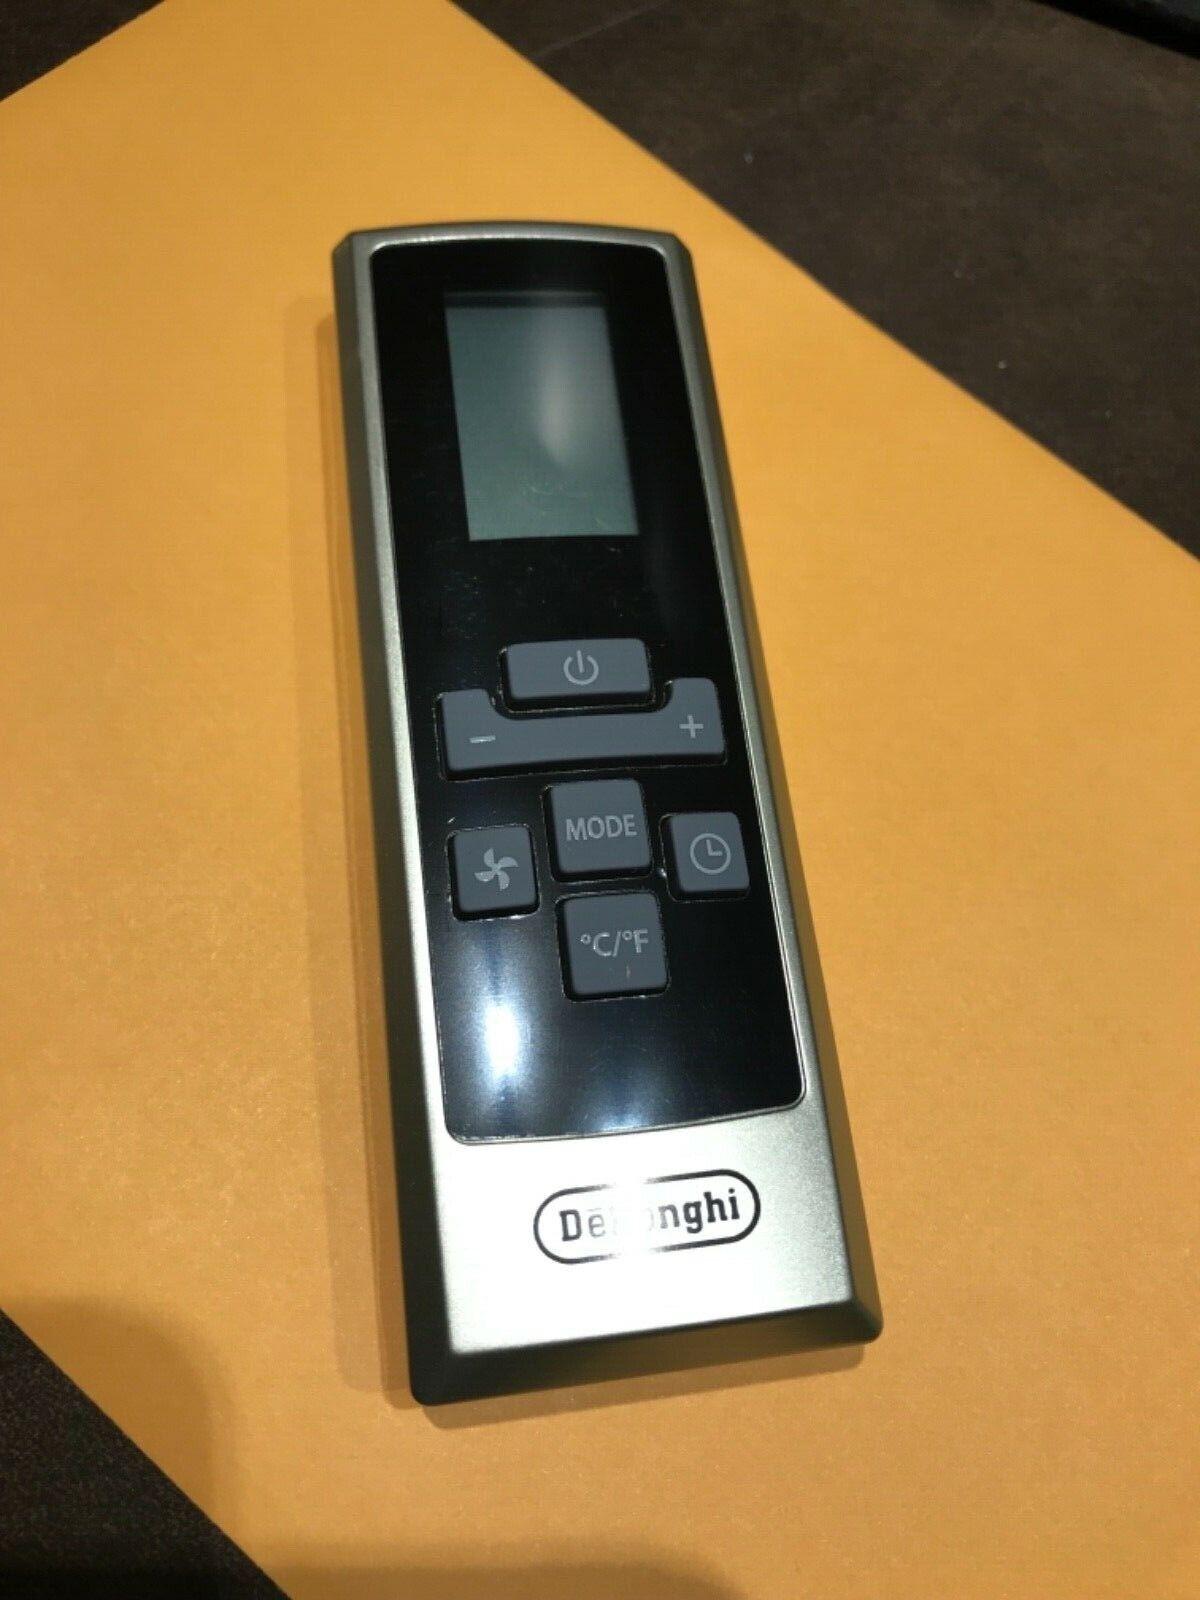 New! OEM Genuine DeLonghi AC- 5515110351 remote control